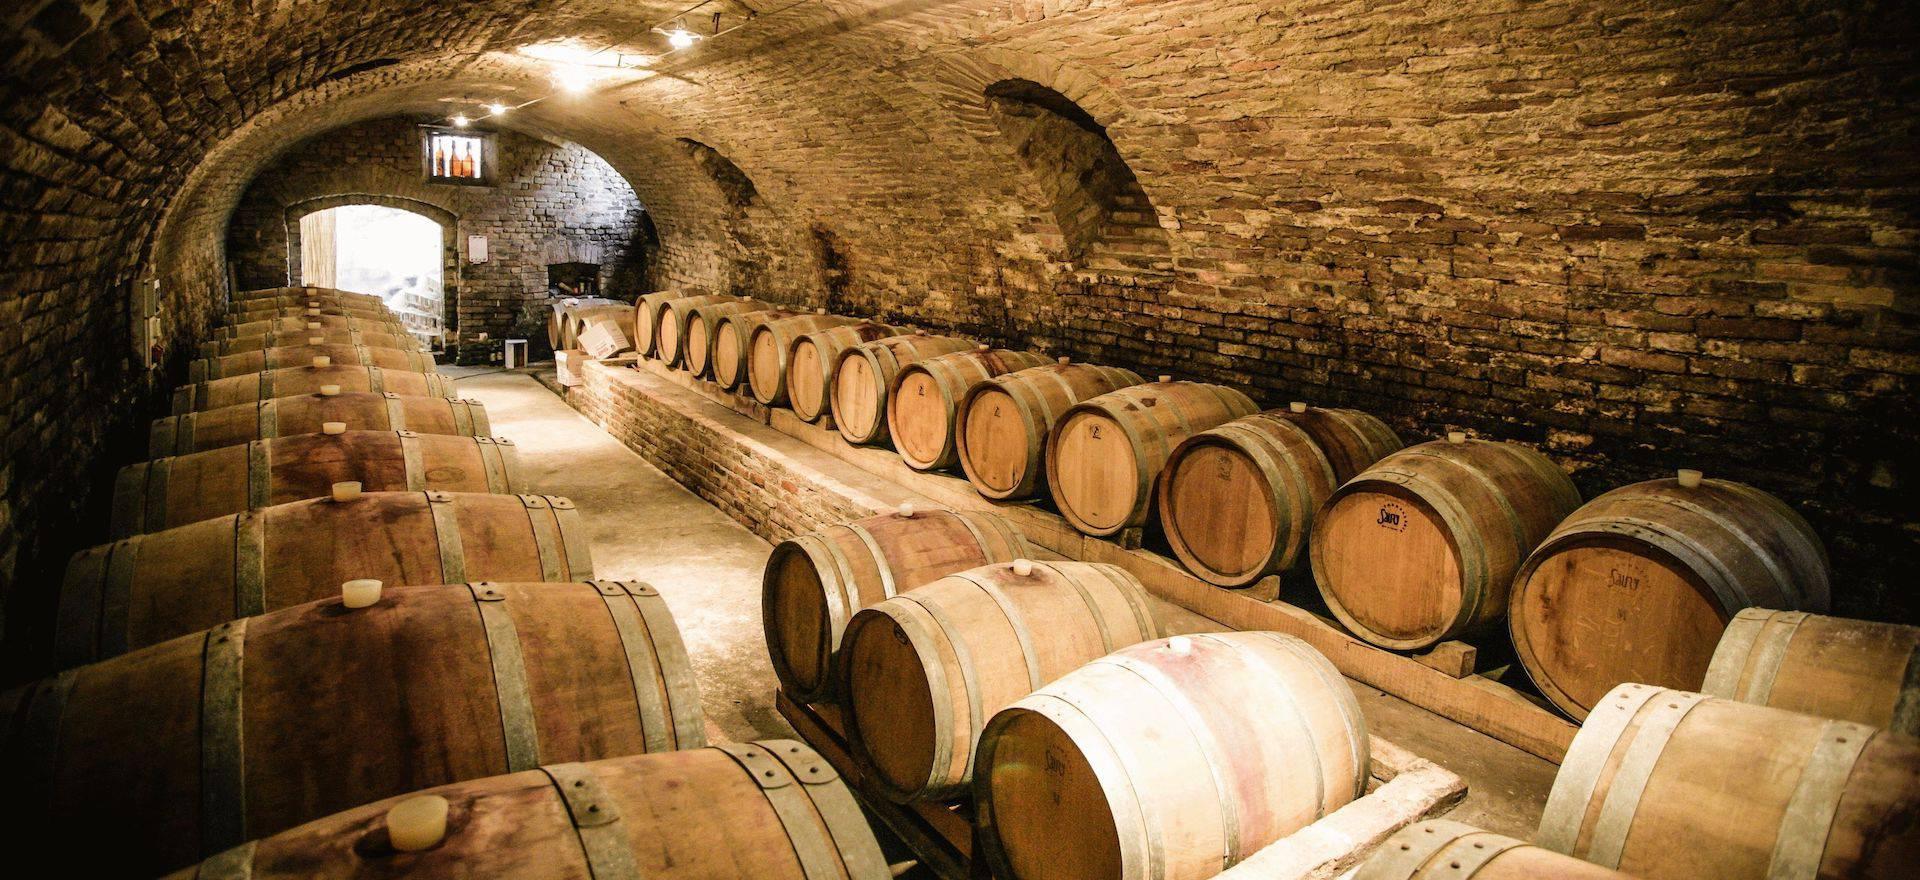 Agriturismo Piemonte Knusse agriturismo in Piemonte tussen de wijngaarden